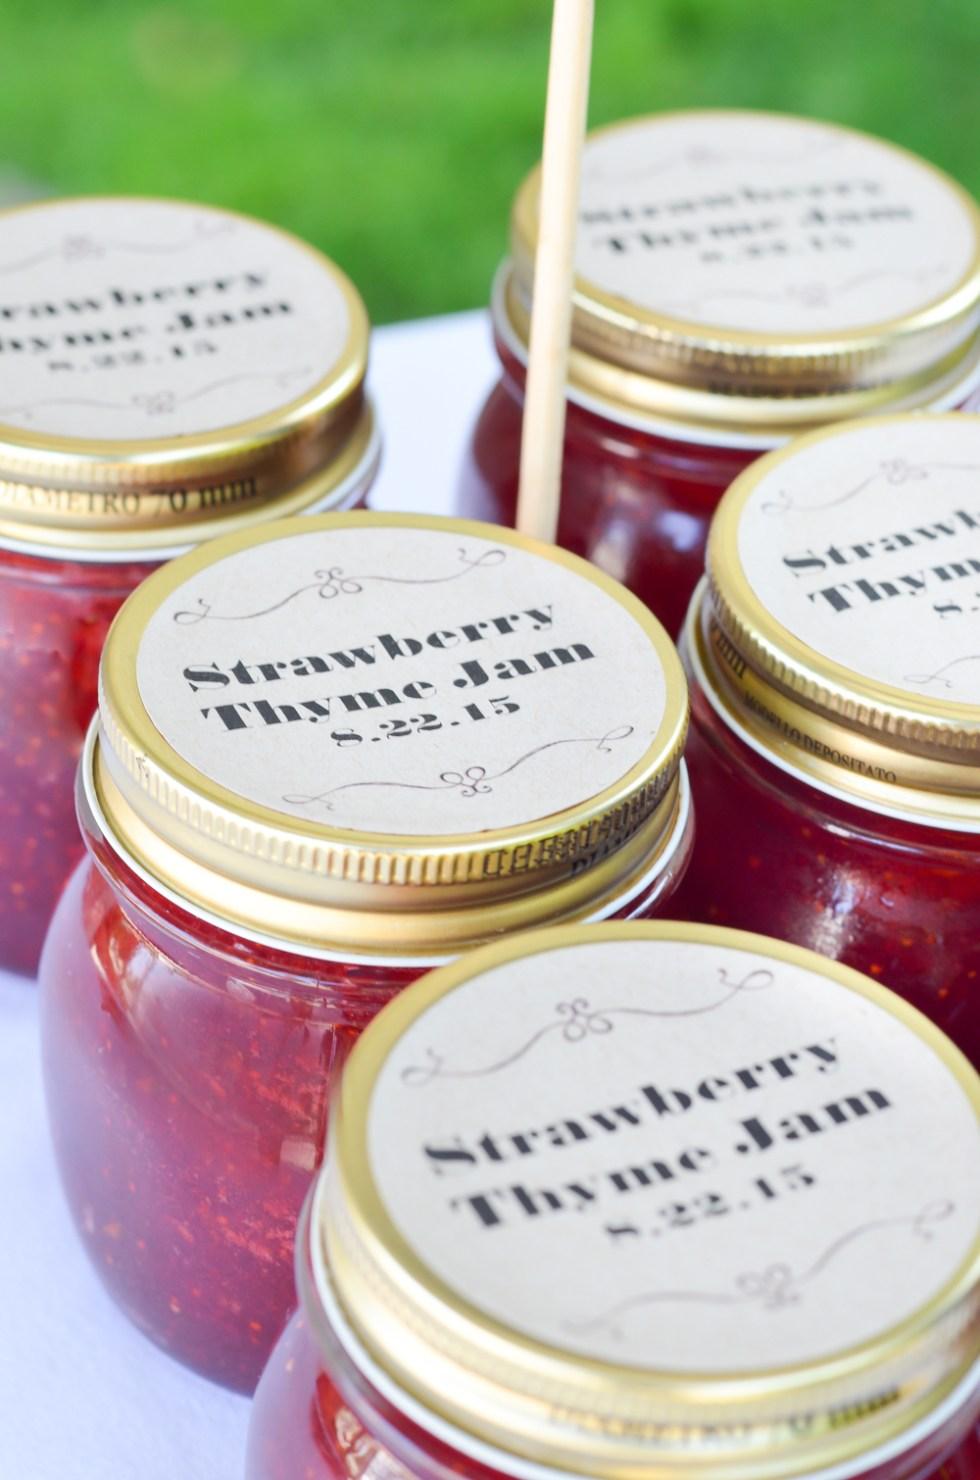 Homemade Jam Wedding Favors Recipe + Supplies | Luci\'s Morsels